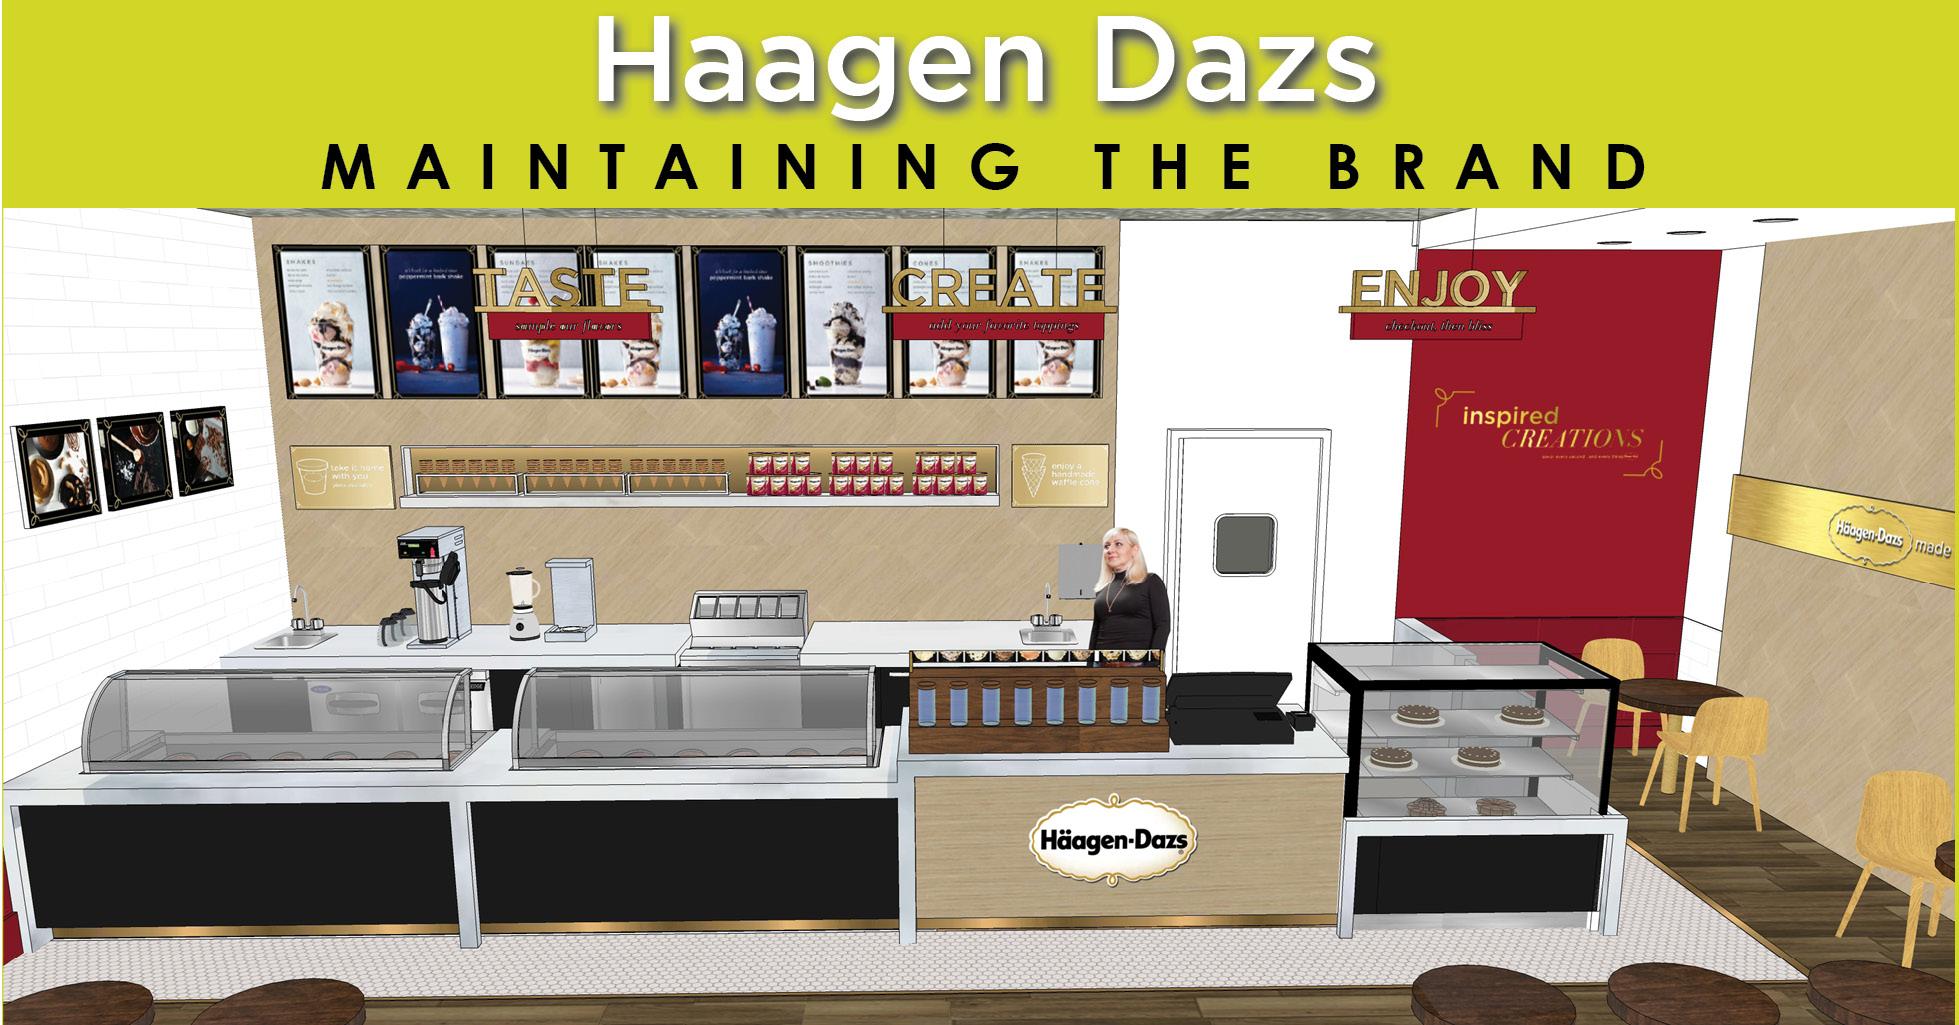 Haagen Dazs I maintaining the Brand